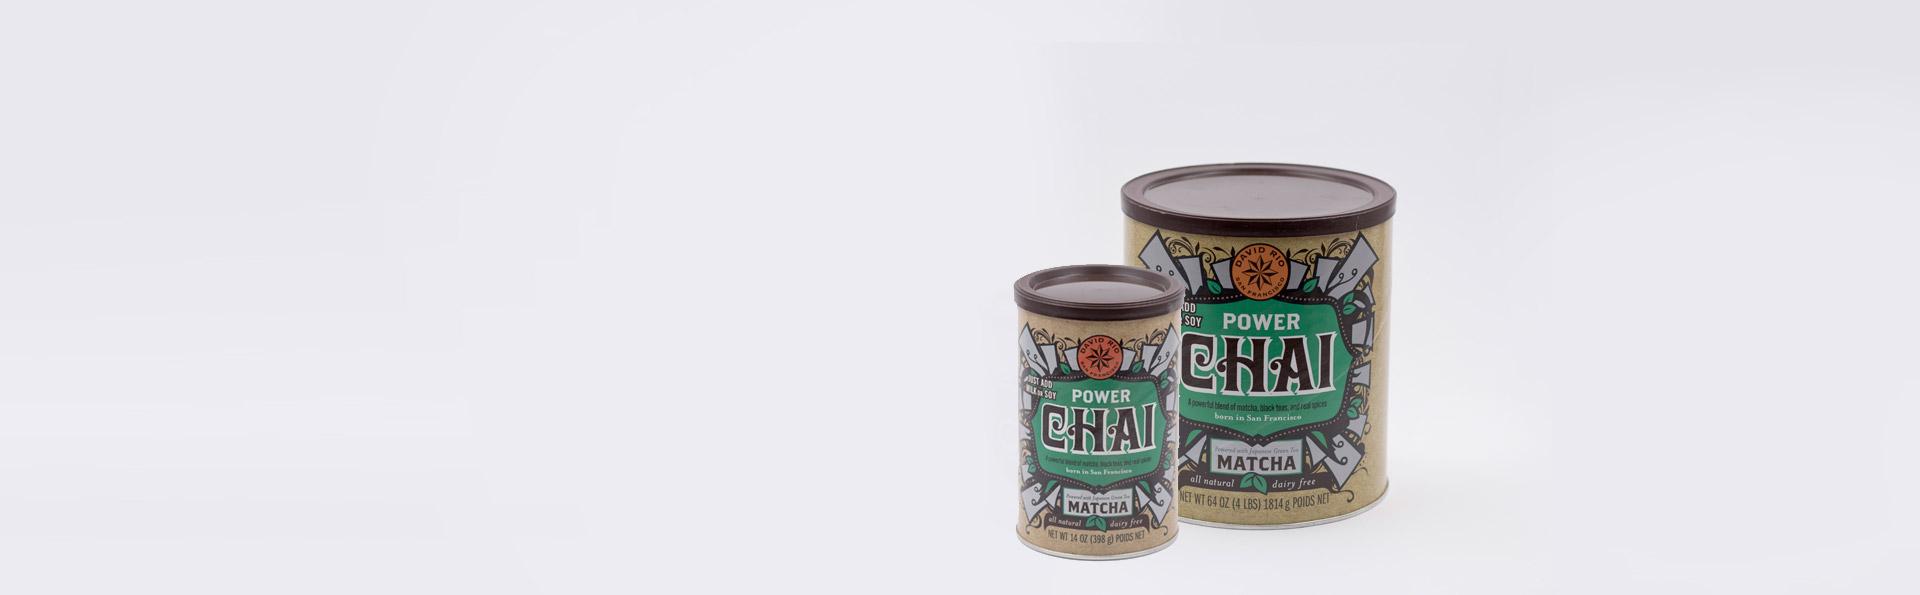 chai-latte-soluble-te-infusion-david-rio-power-matcha